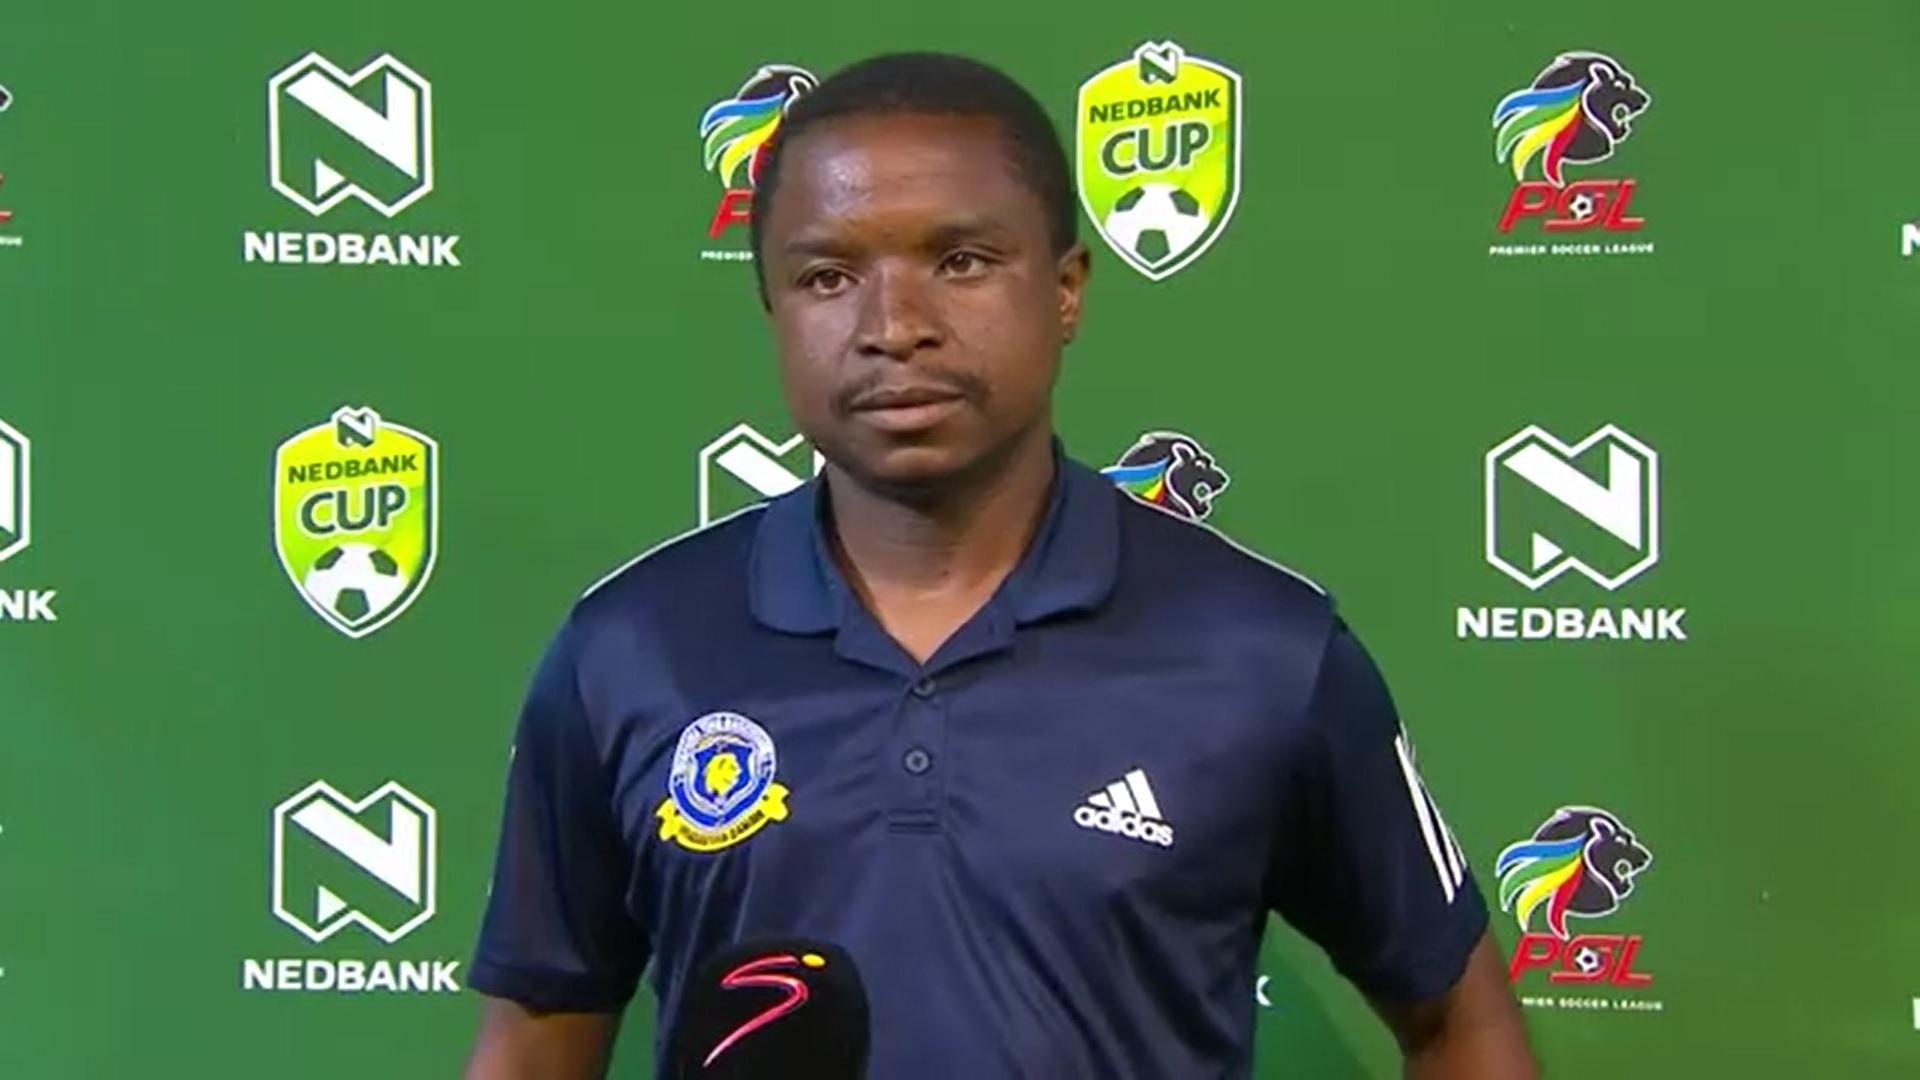 Nedbank Cup | QF | Black Leopards v Tshakhuma Tsha Madzivhandila | Post-match interview with David Mathebula